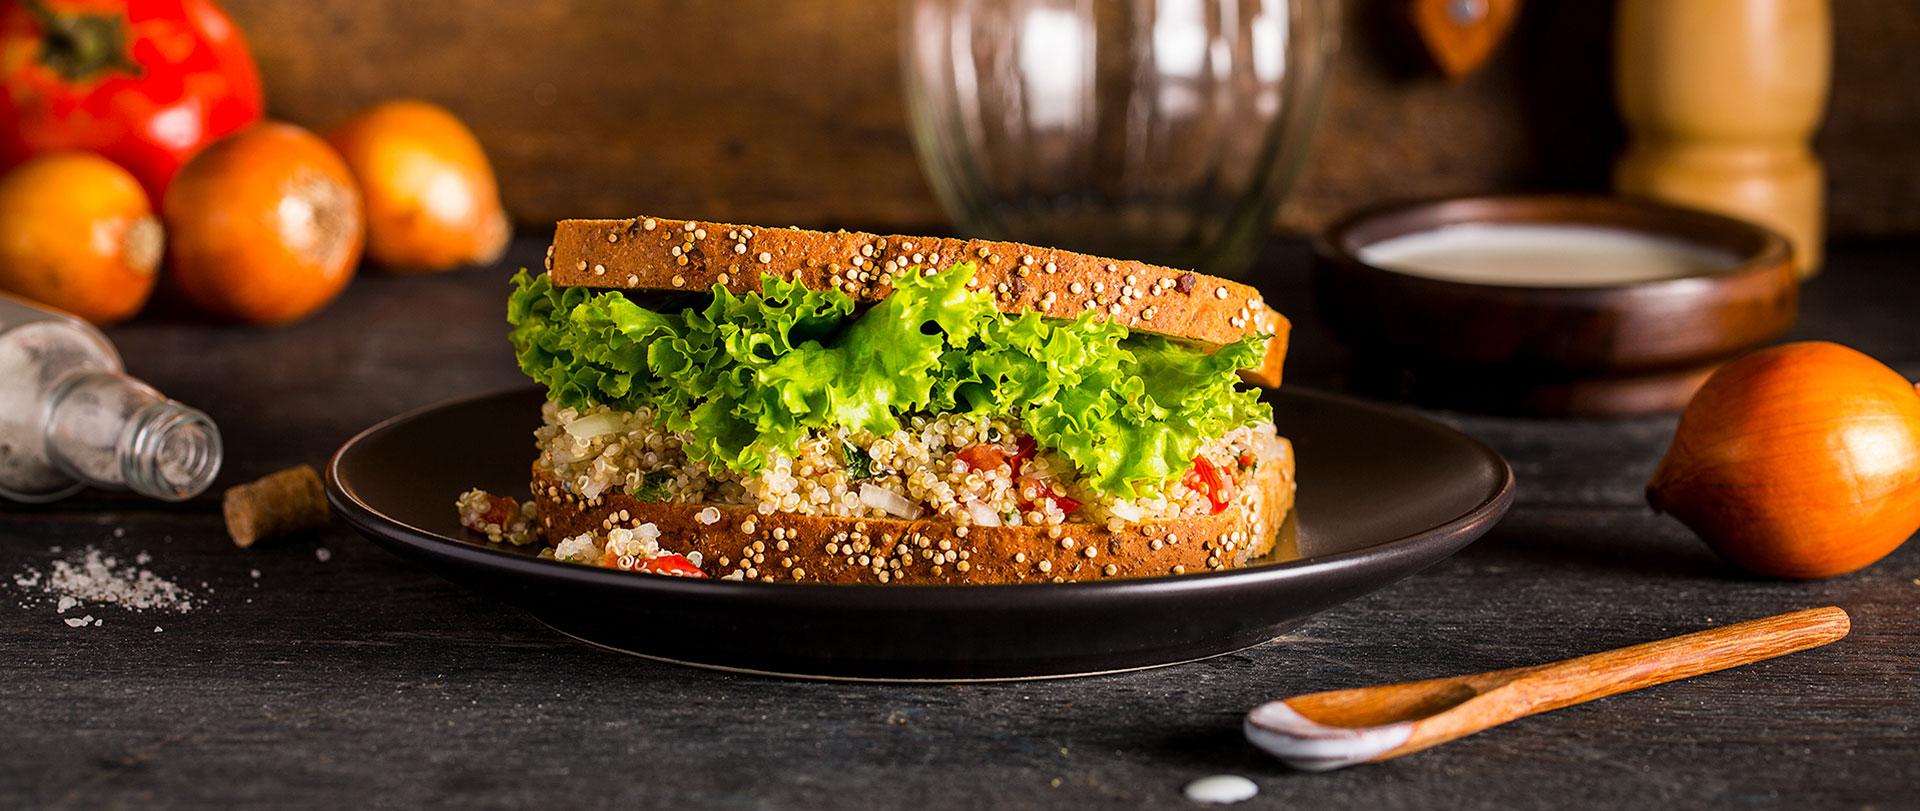 Sanduíche com tabule de quinoa, alface e coalhada